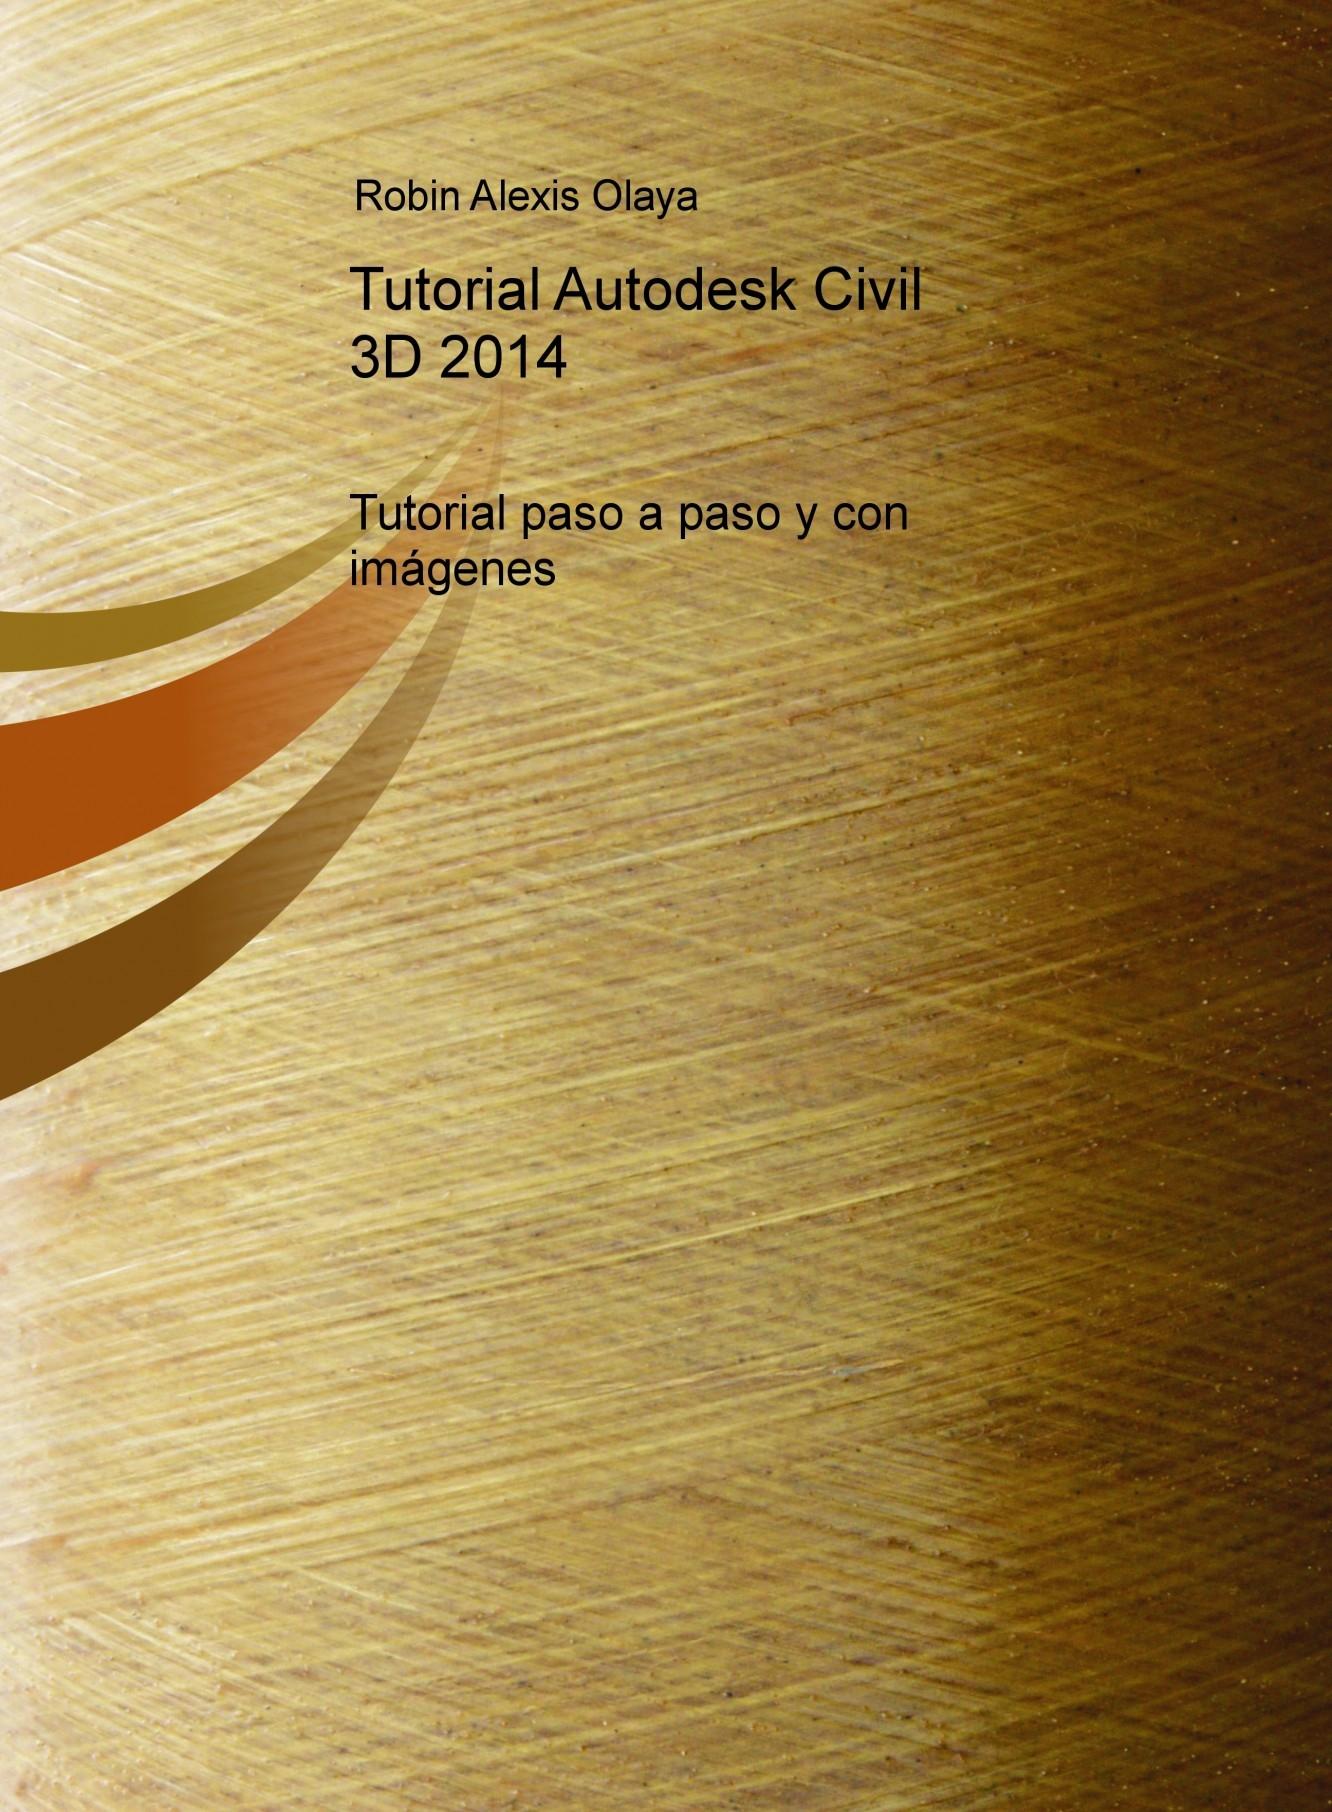 Tutorial Autodesk Civil 3D 2014